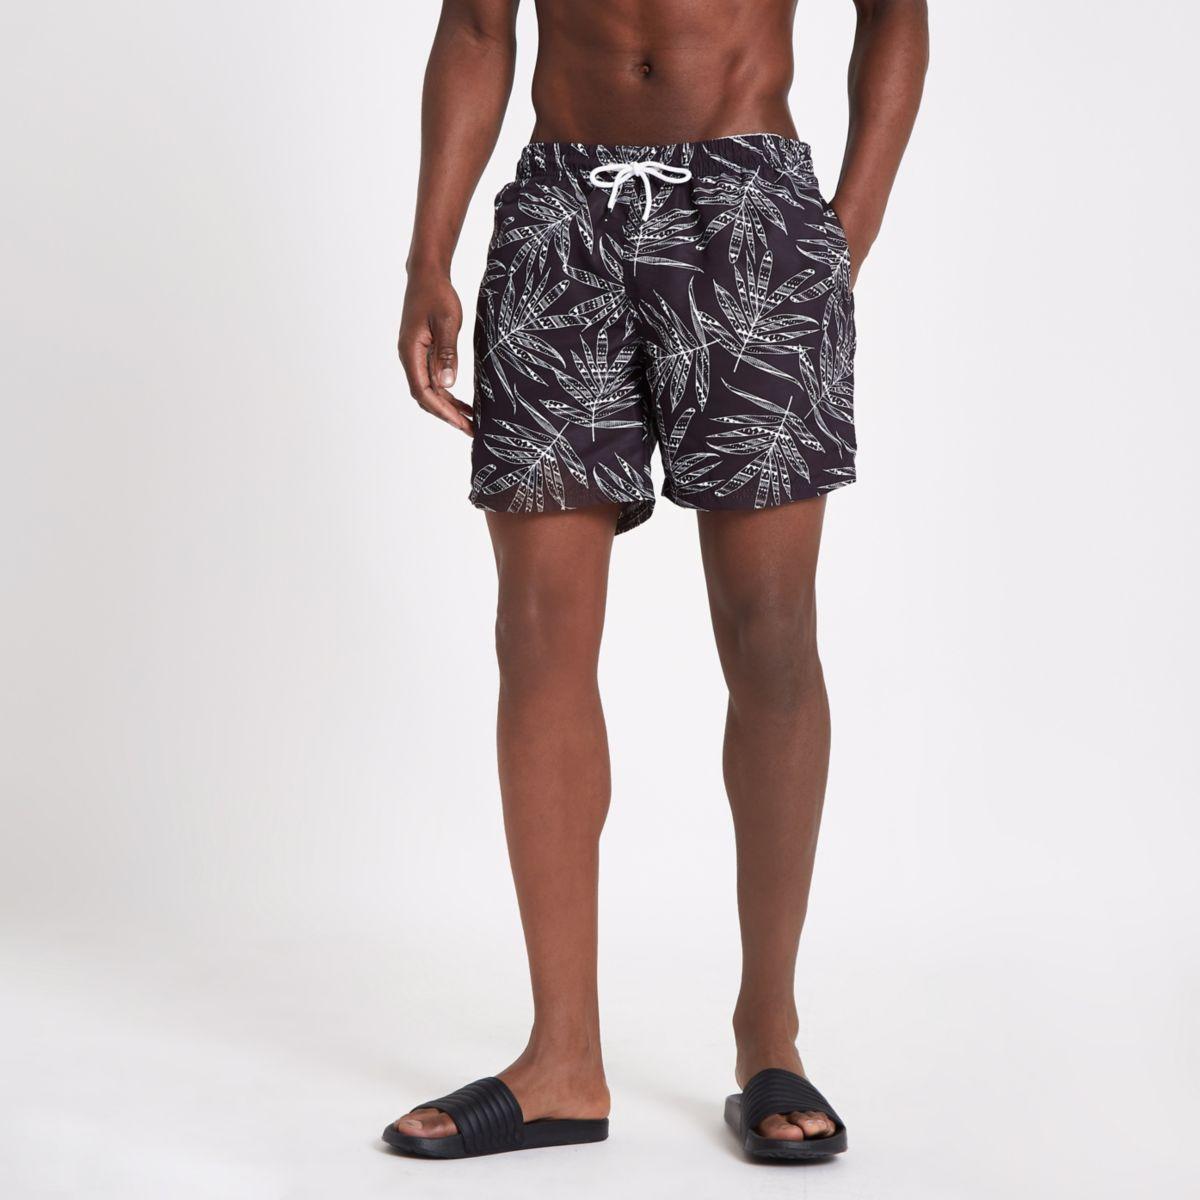 Black monochrome print swim trunks